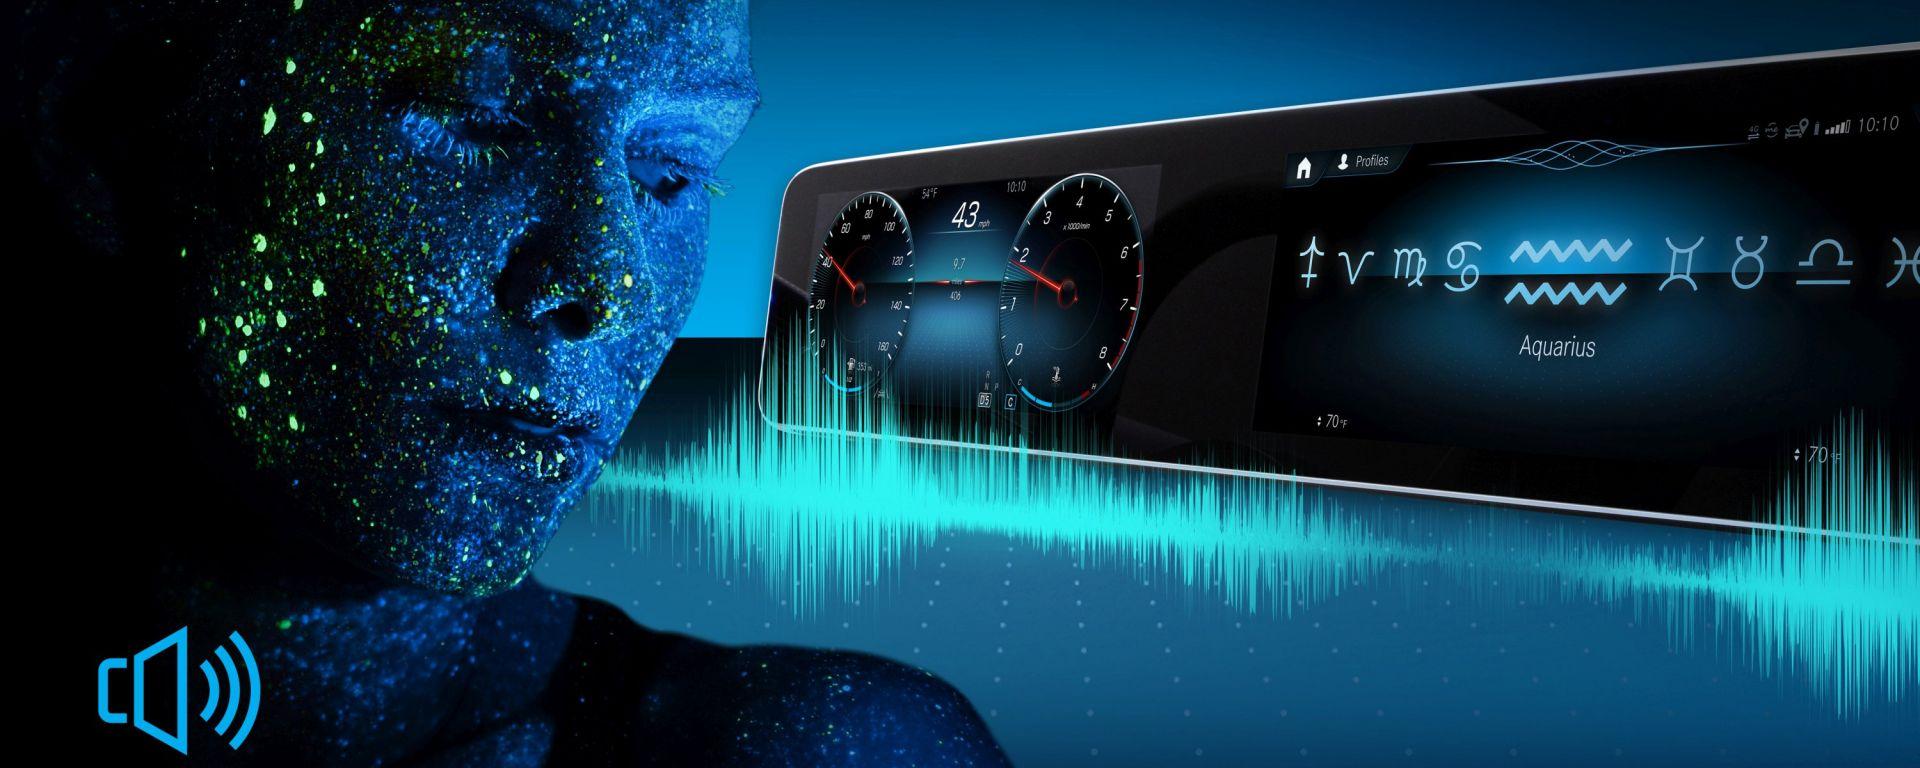 MBUX, l'infotainment di Mercedes legge oroscopo e quiz